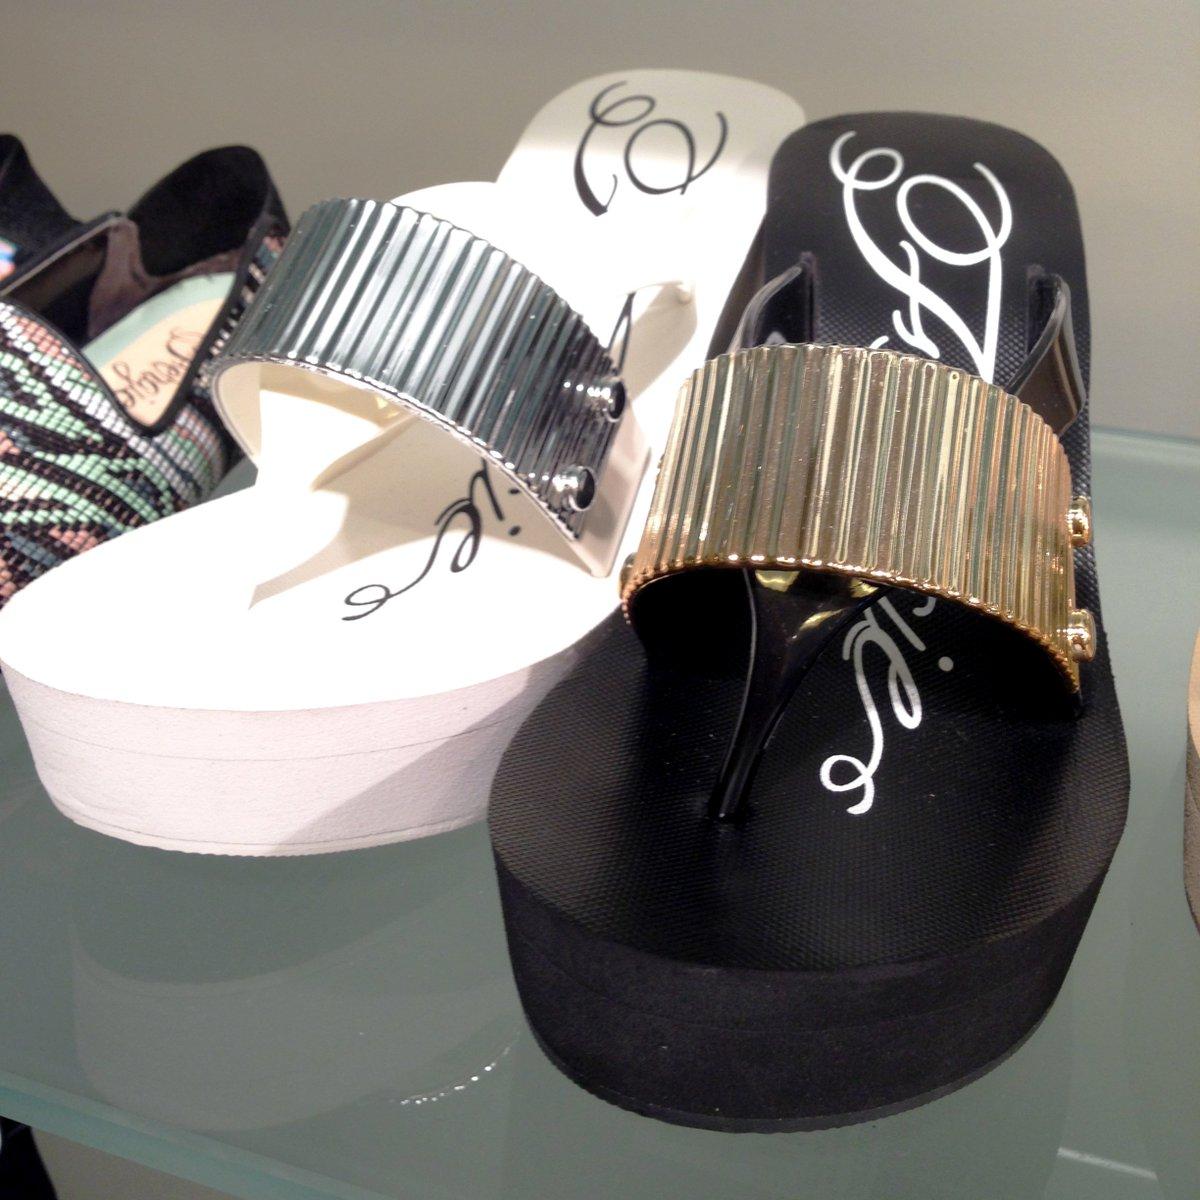 RT @FergieFootwear: Keep yr head, #heels & standards… #high.☺ #fergie #highheels #highshoes #flipflops #happy420 https://t.co/LxIgeZuxuD ht…